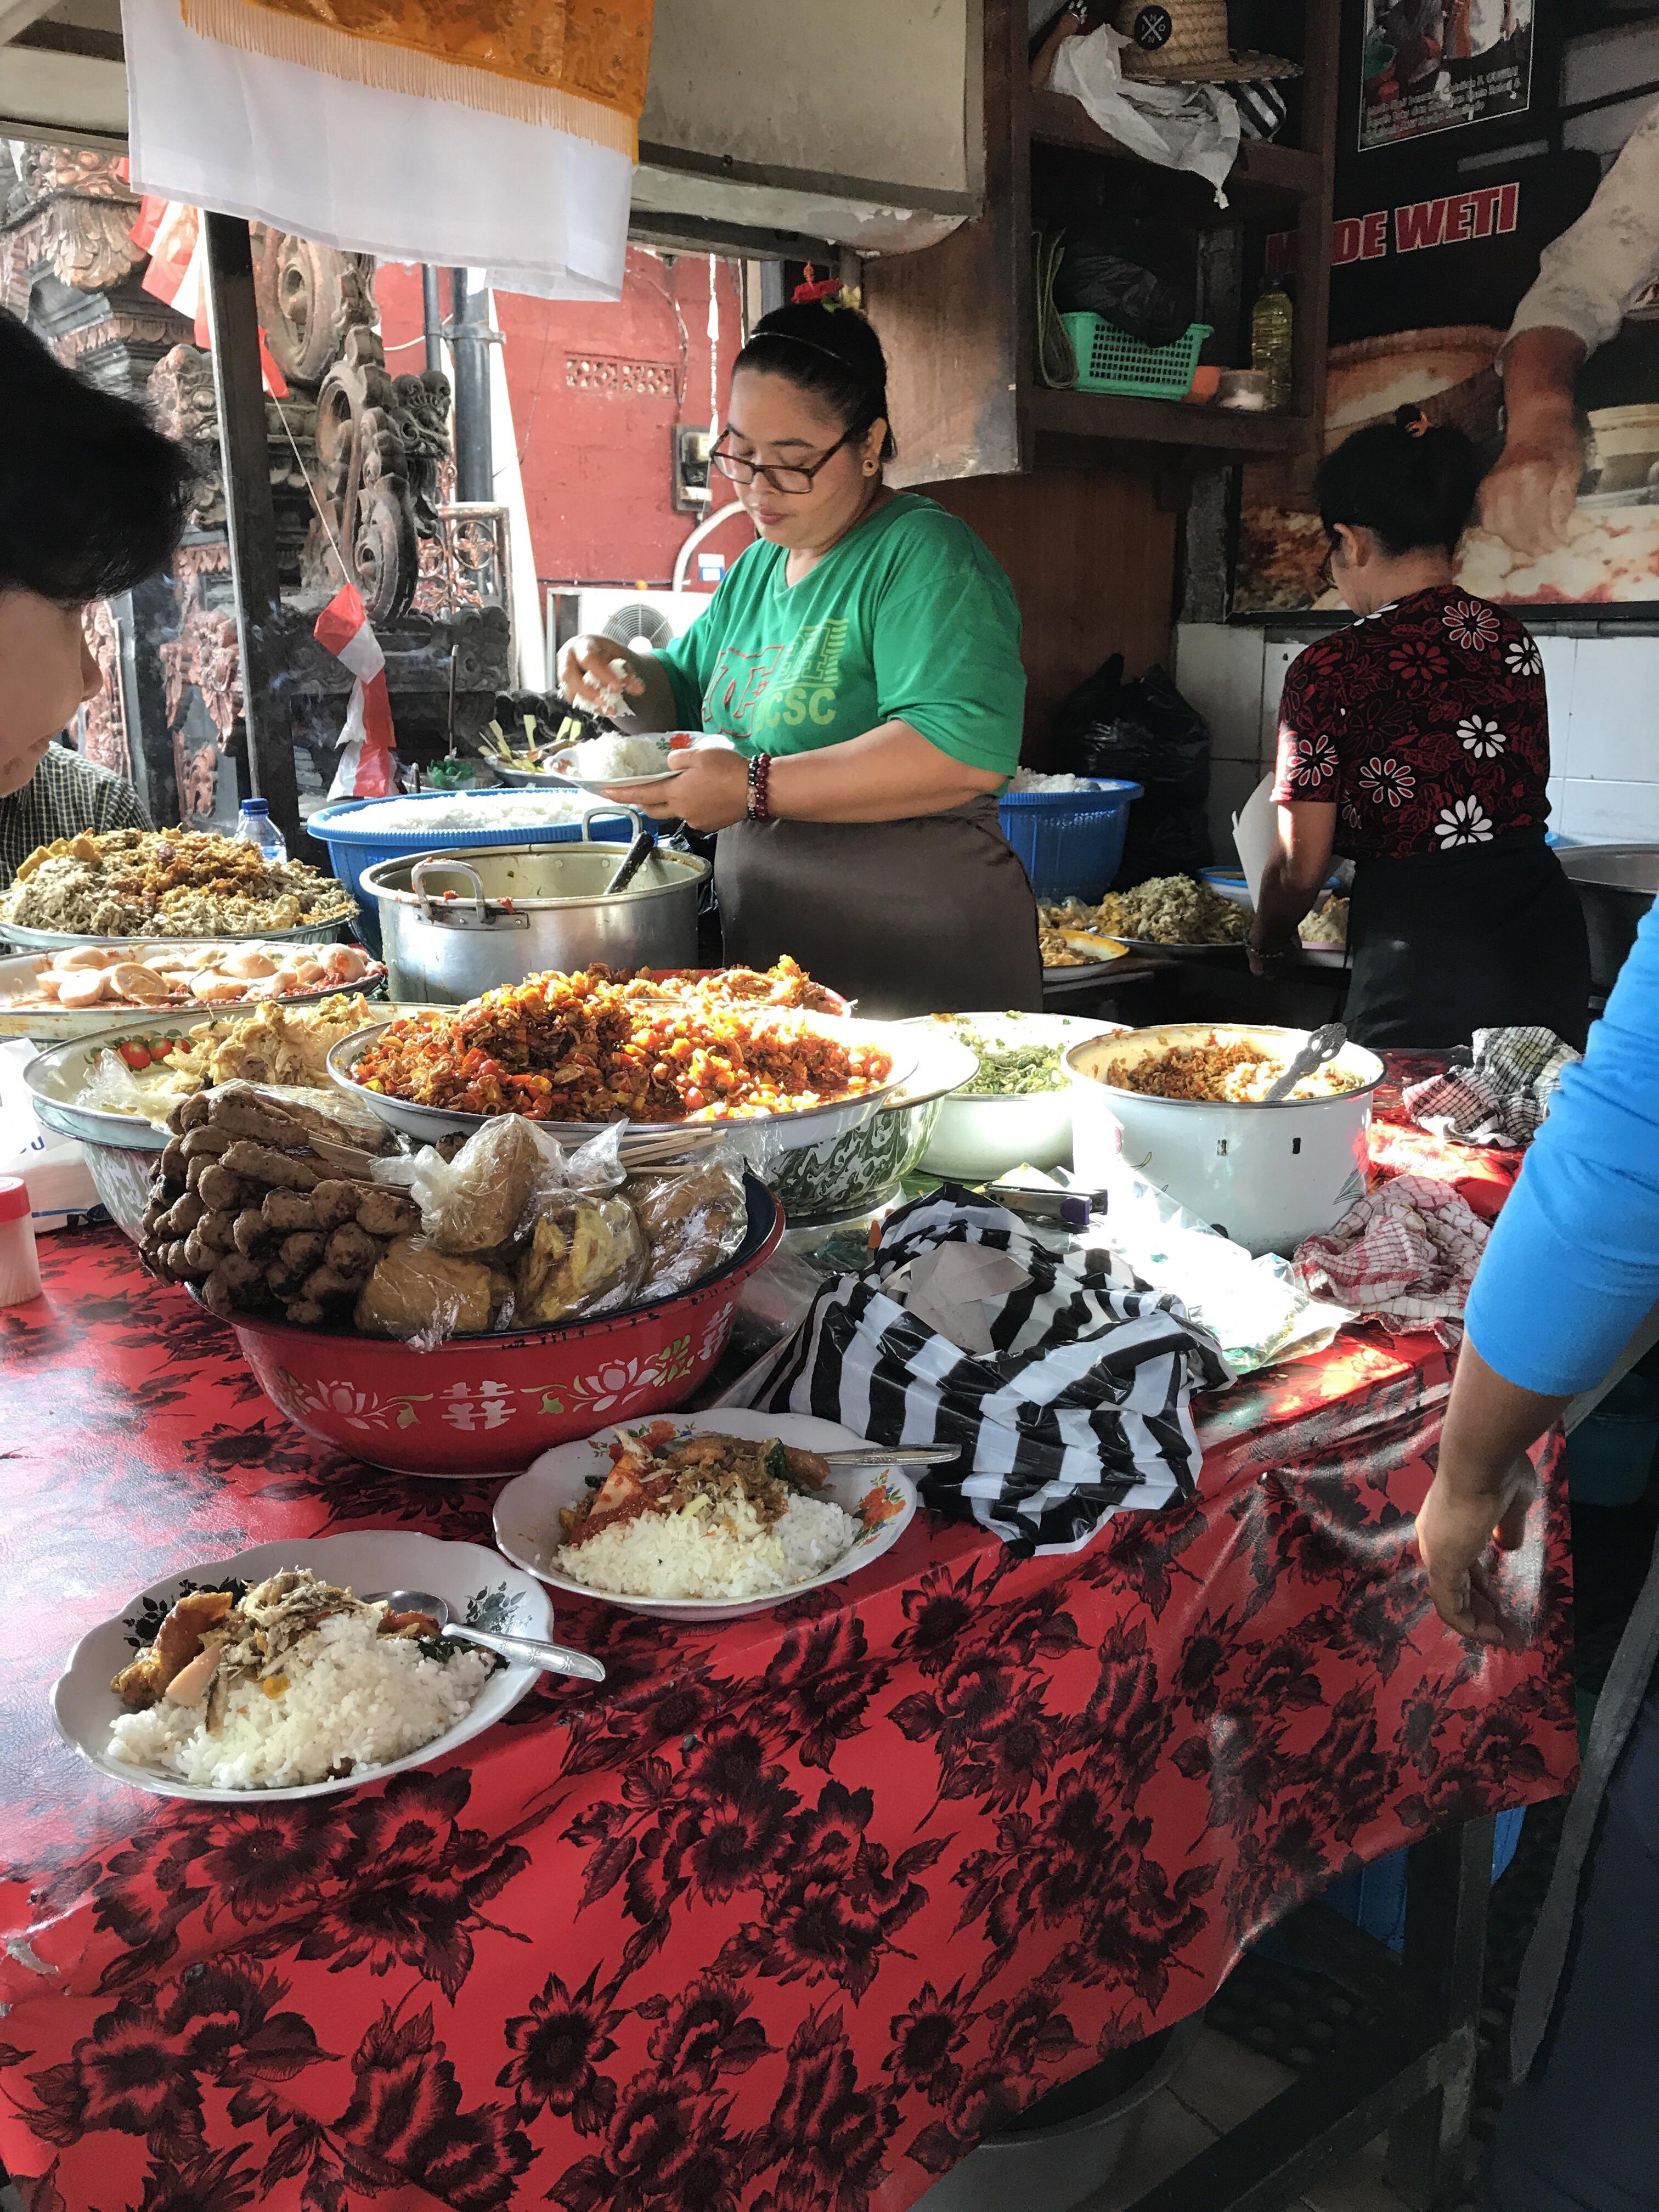 Eating in Bali: Warungs are the Thing, Ohana Retreat Bali